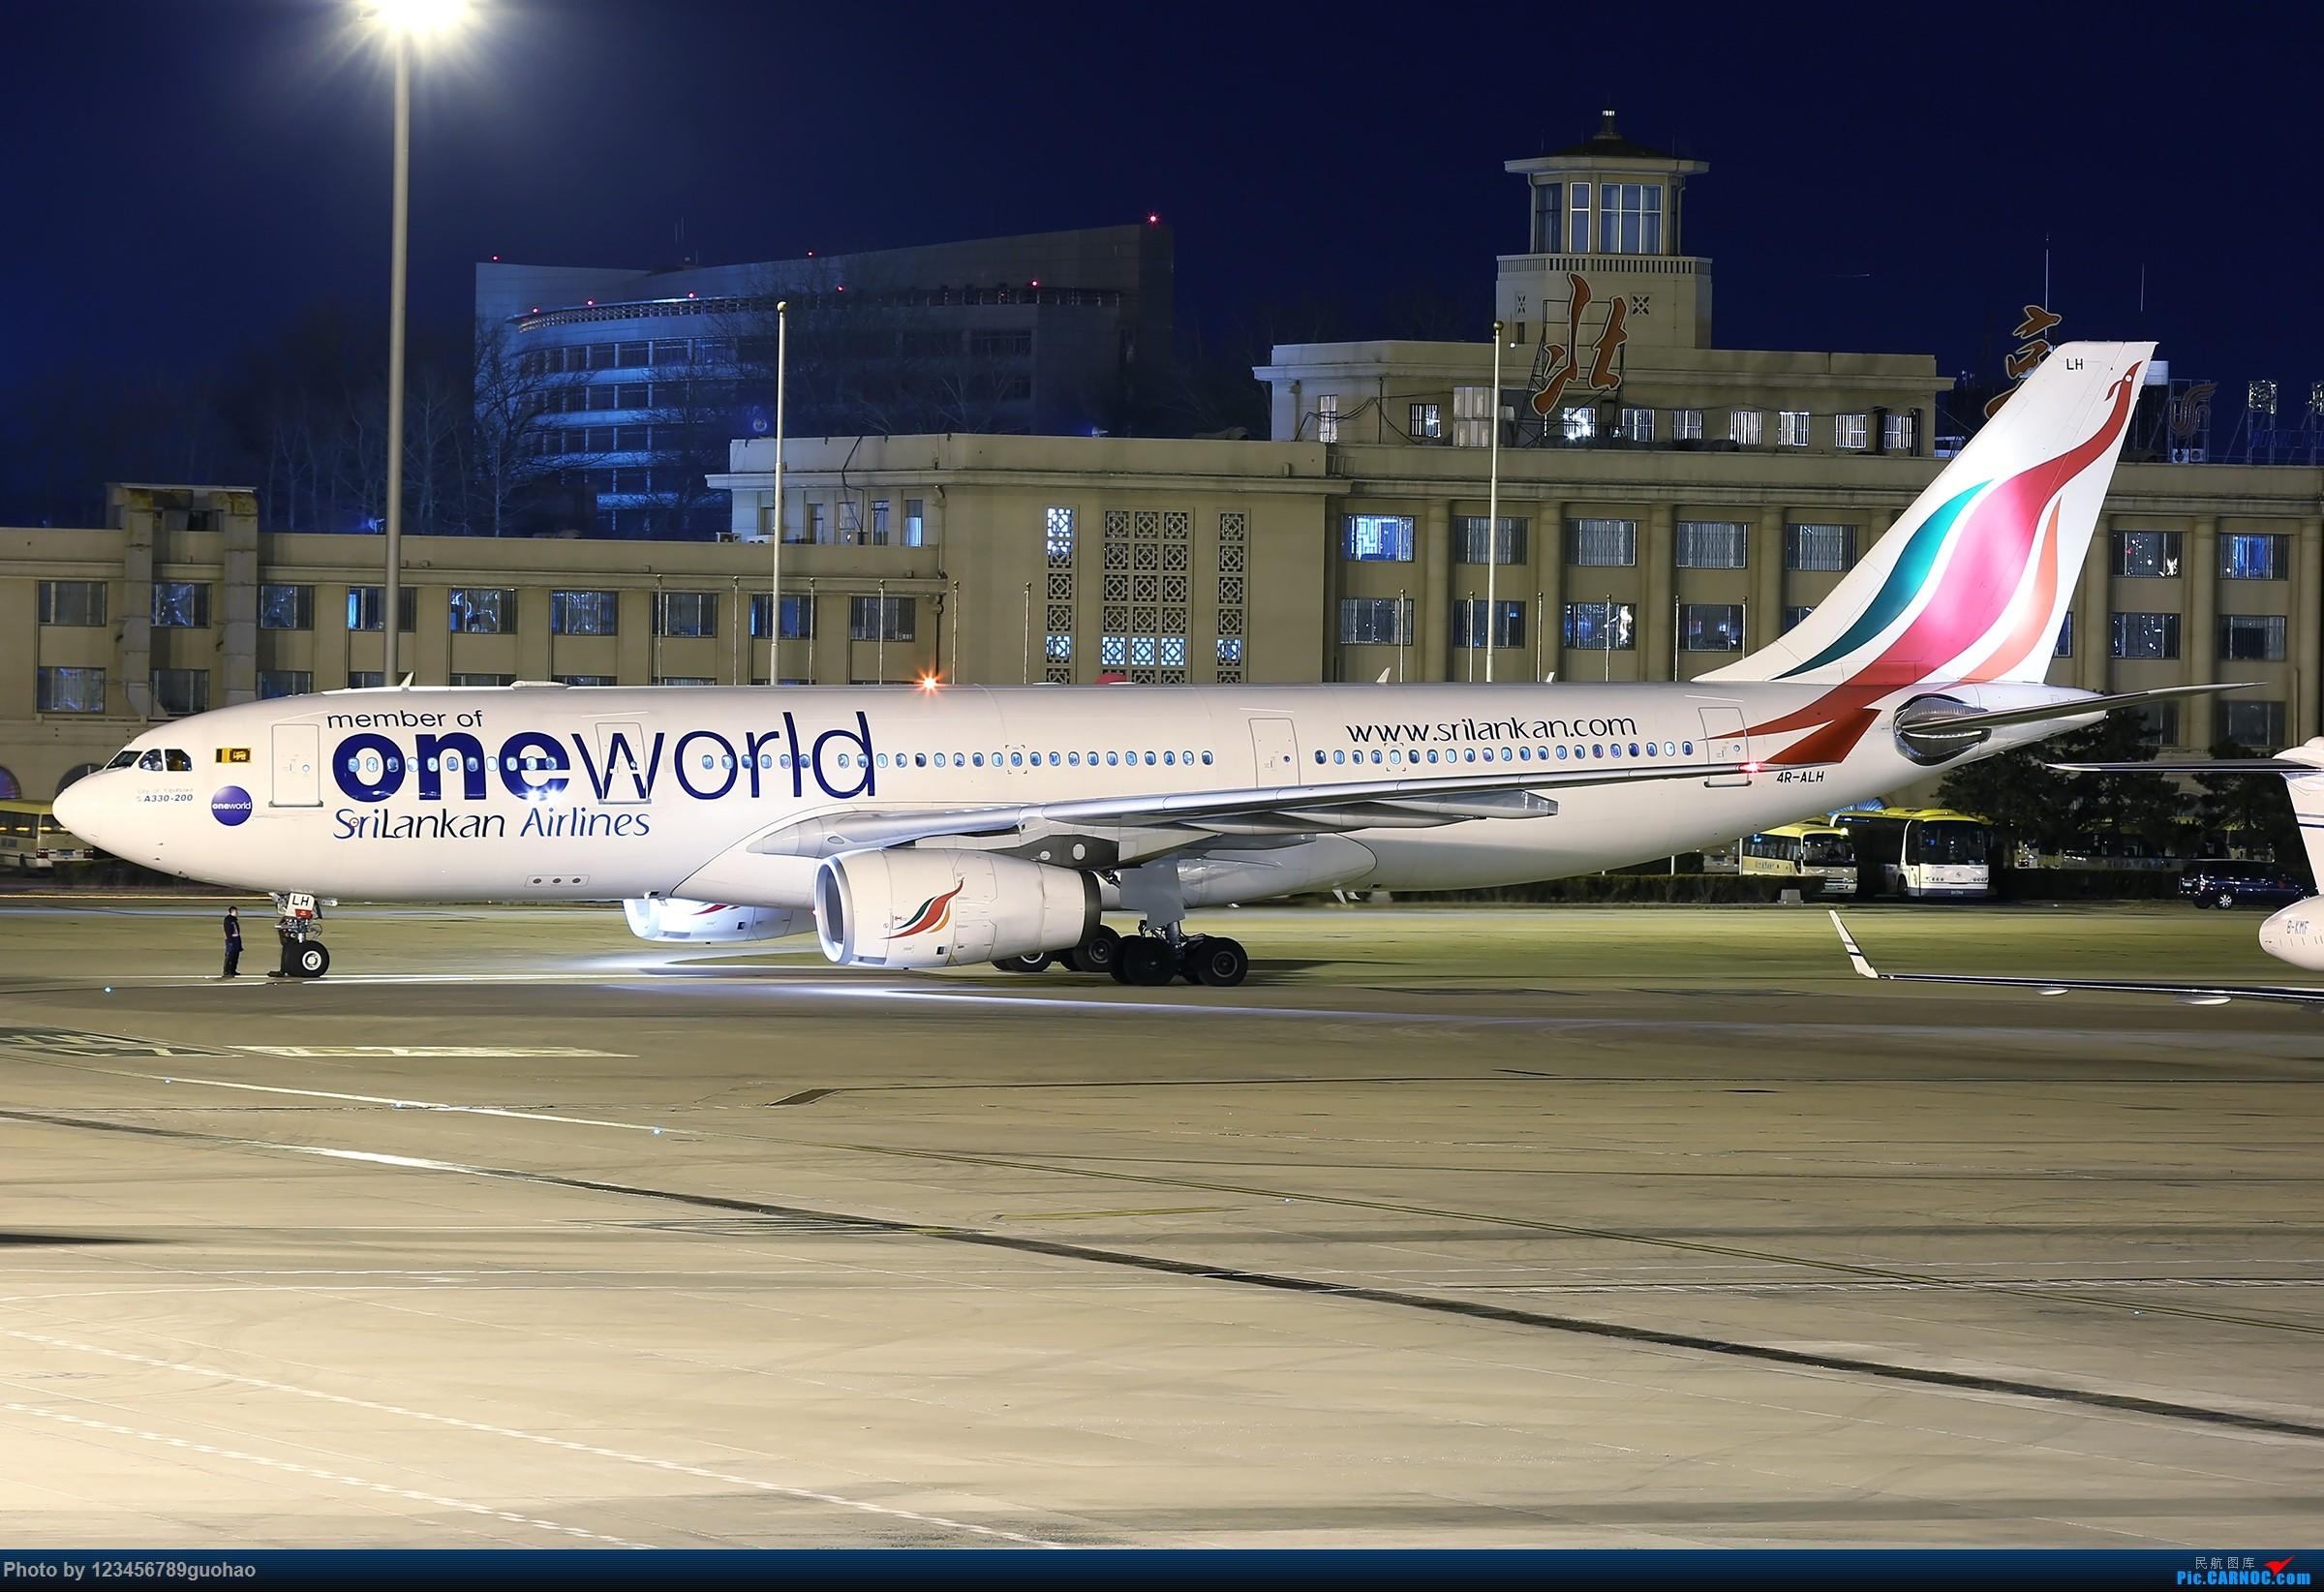 [原创]一图党-斯里兰卡one world AIRBUS A330-200 4R-ALH 北京首都国际机场